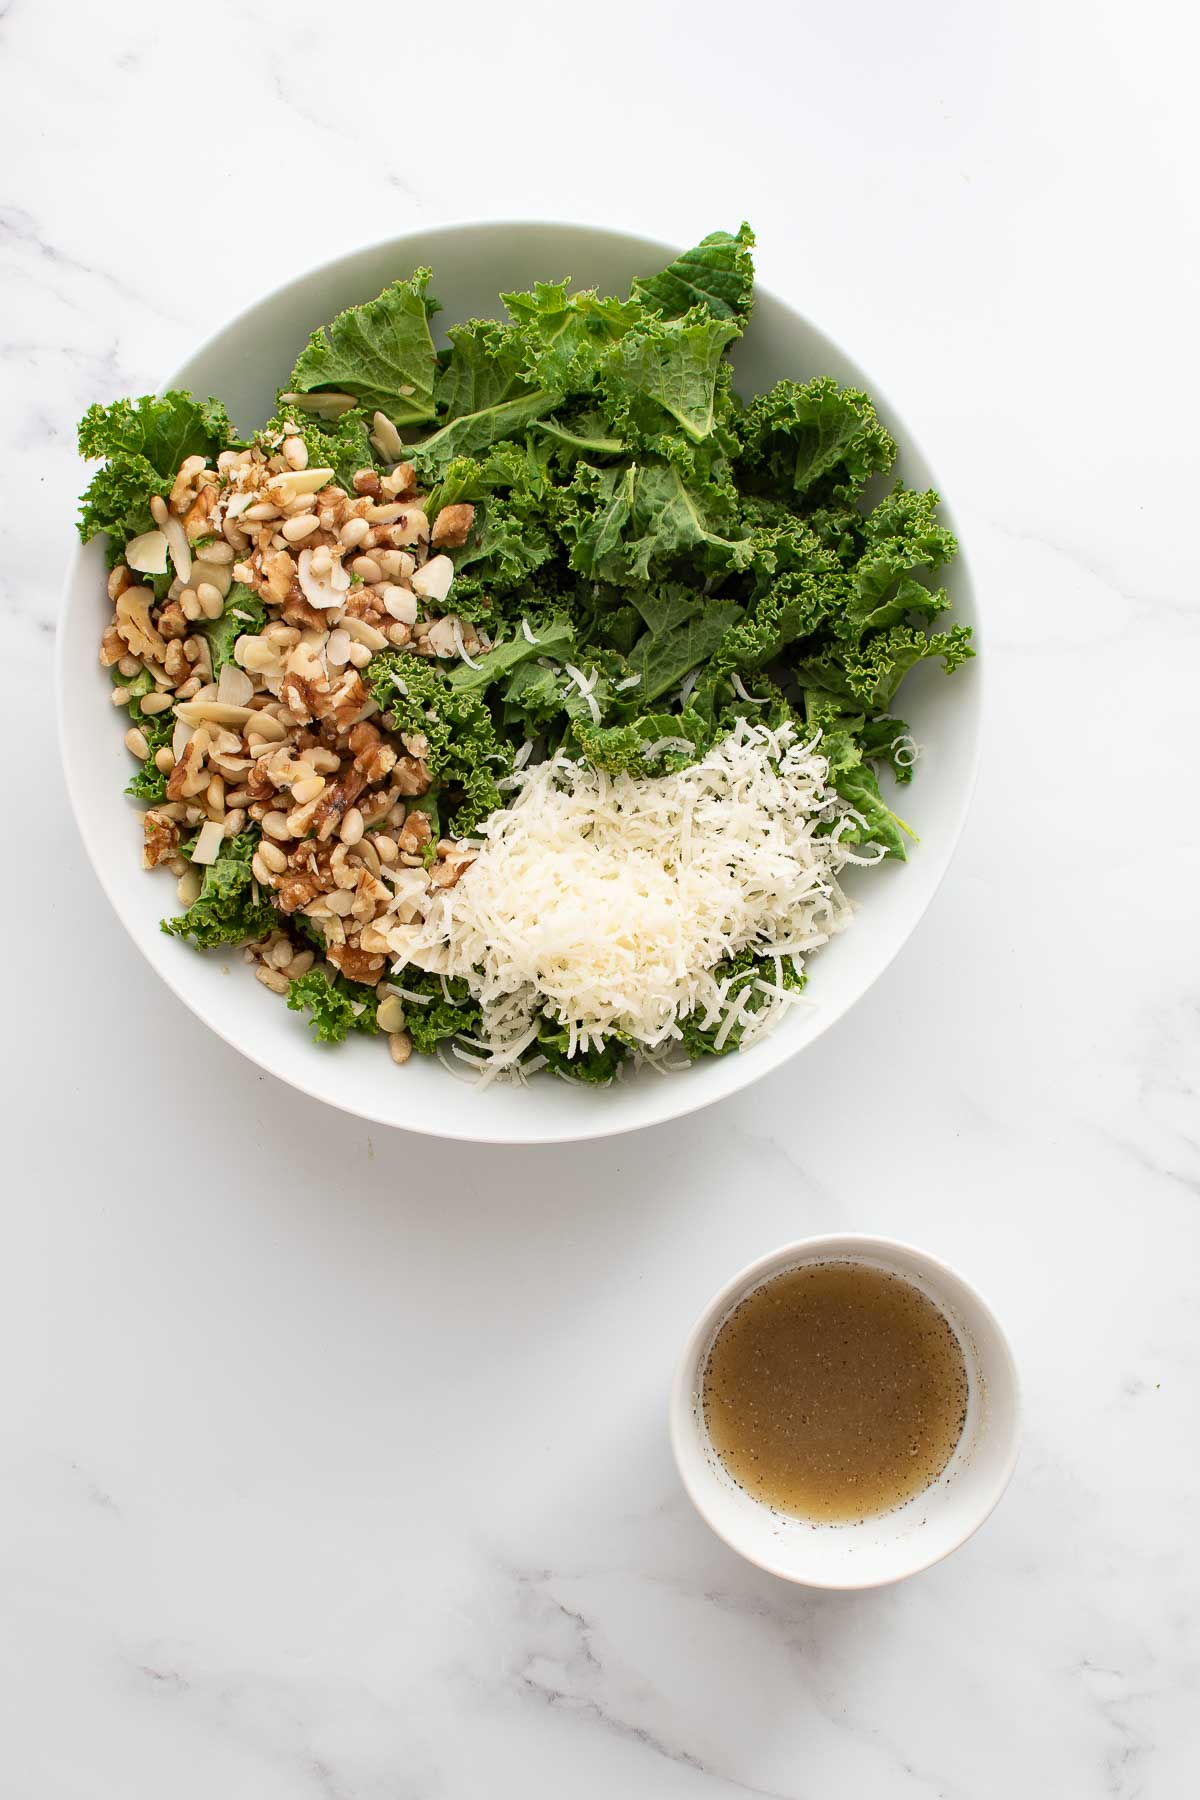 Kale salad with lemon dressing.